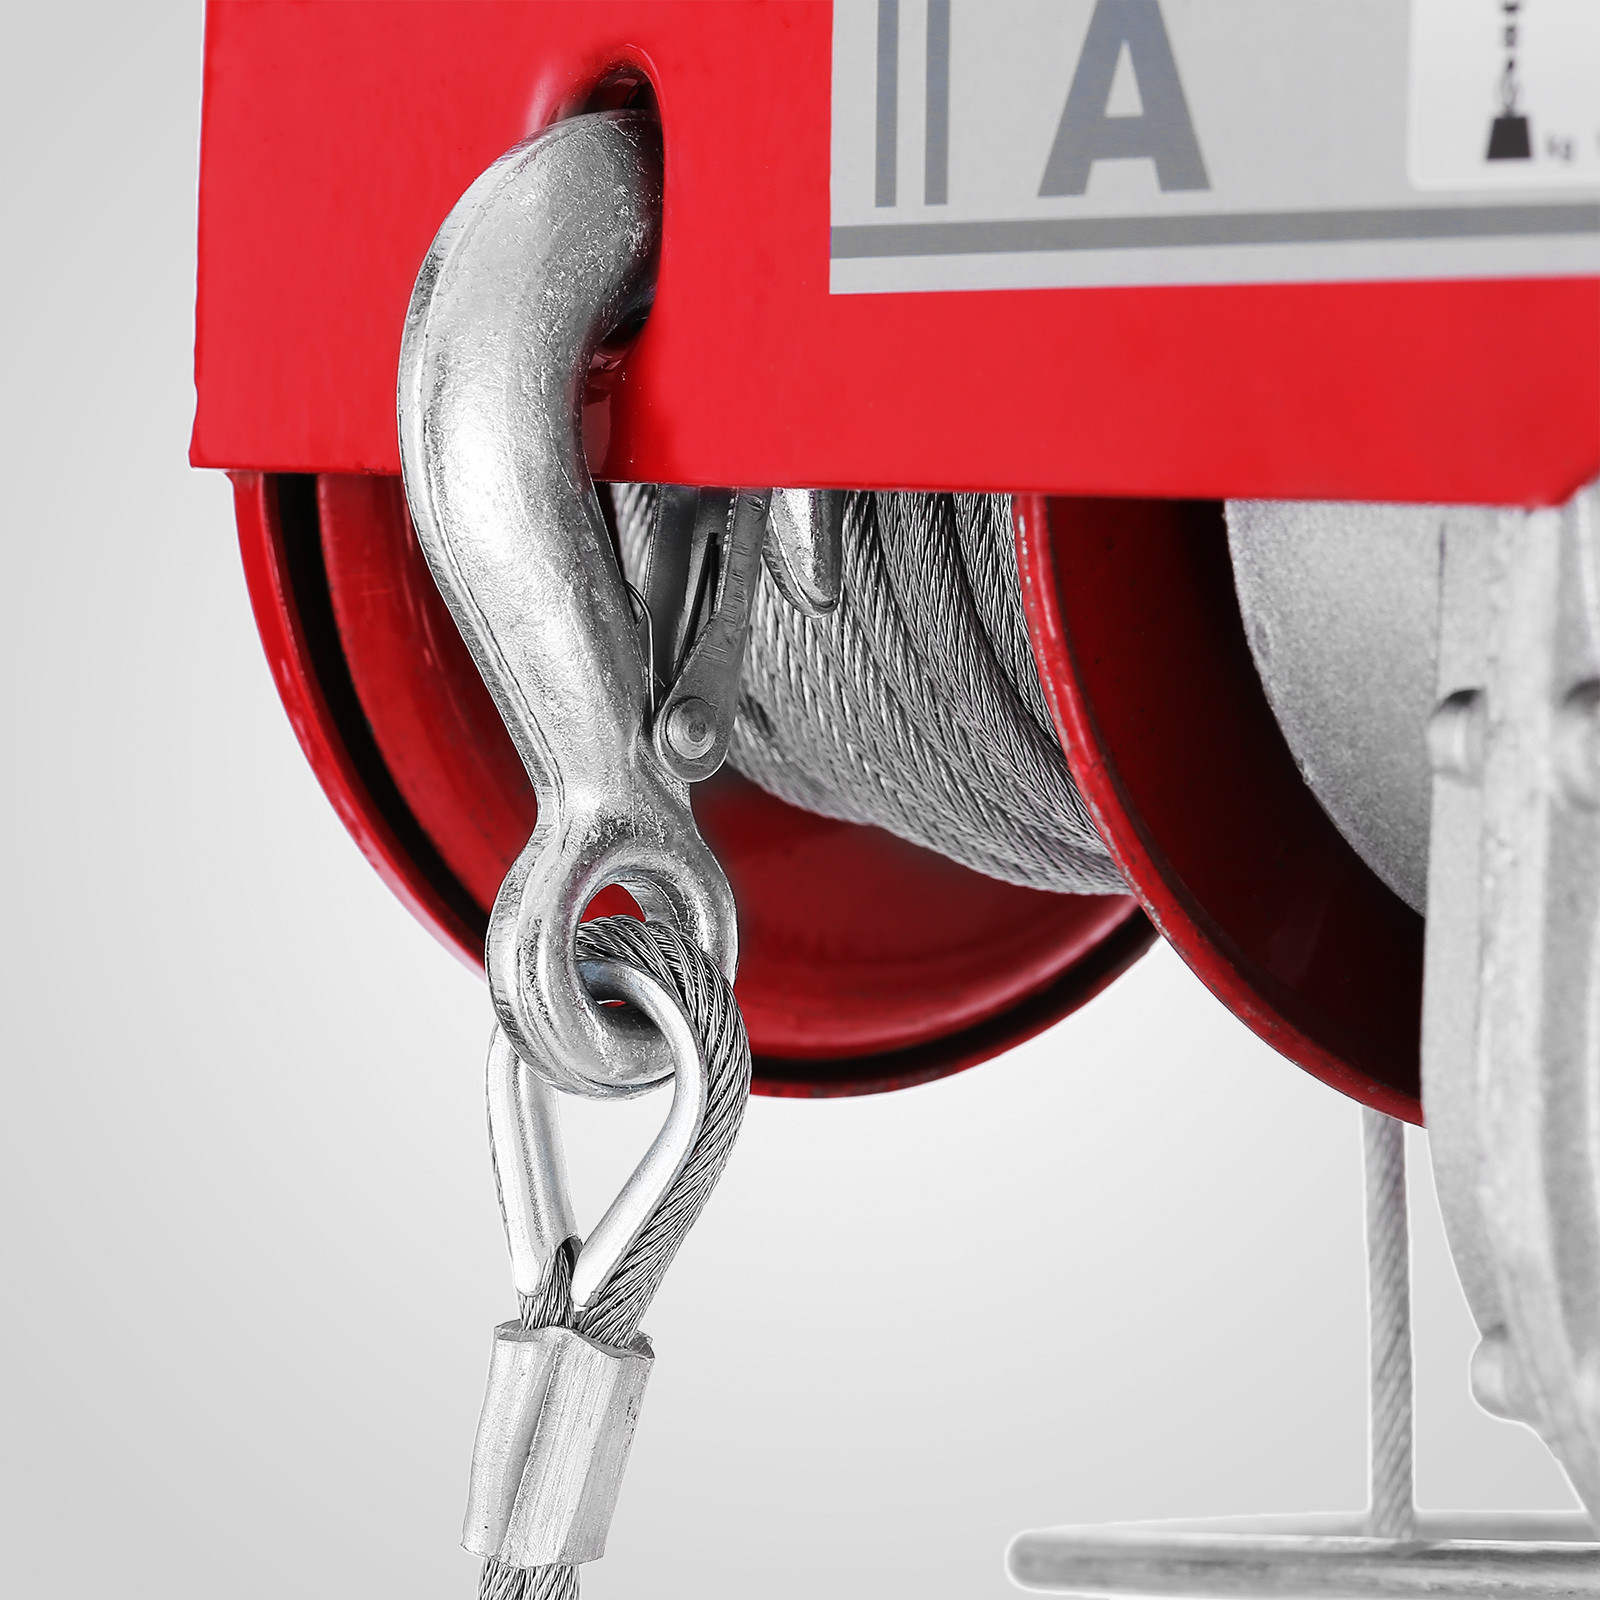 100kg-900kg-Electric-Hoist-Winch-Lifting-Engine-Crane-Cable-Lift-Hook-Garage miniature 21